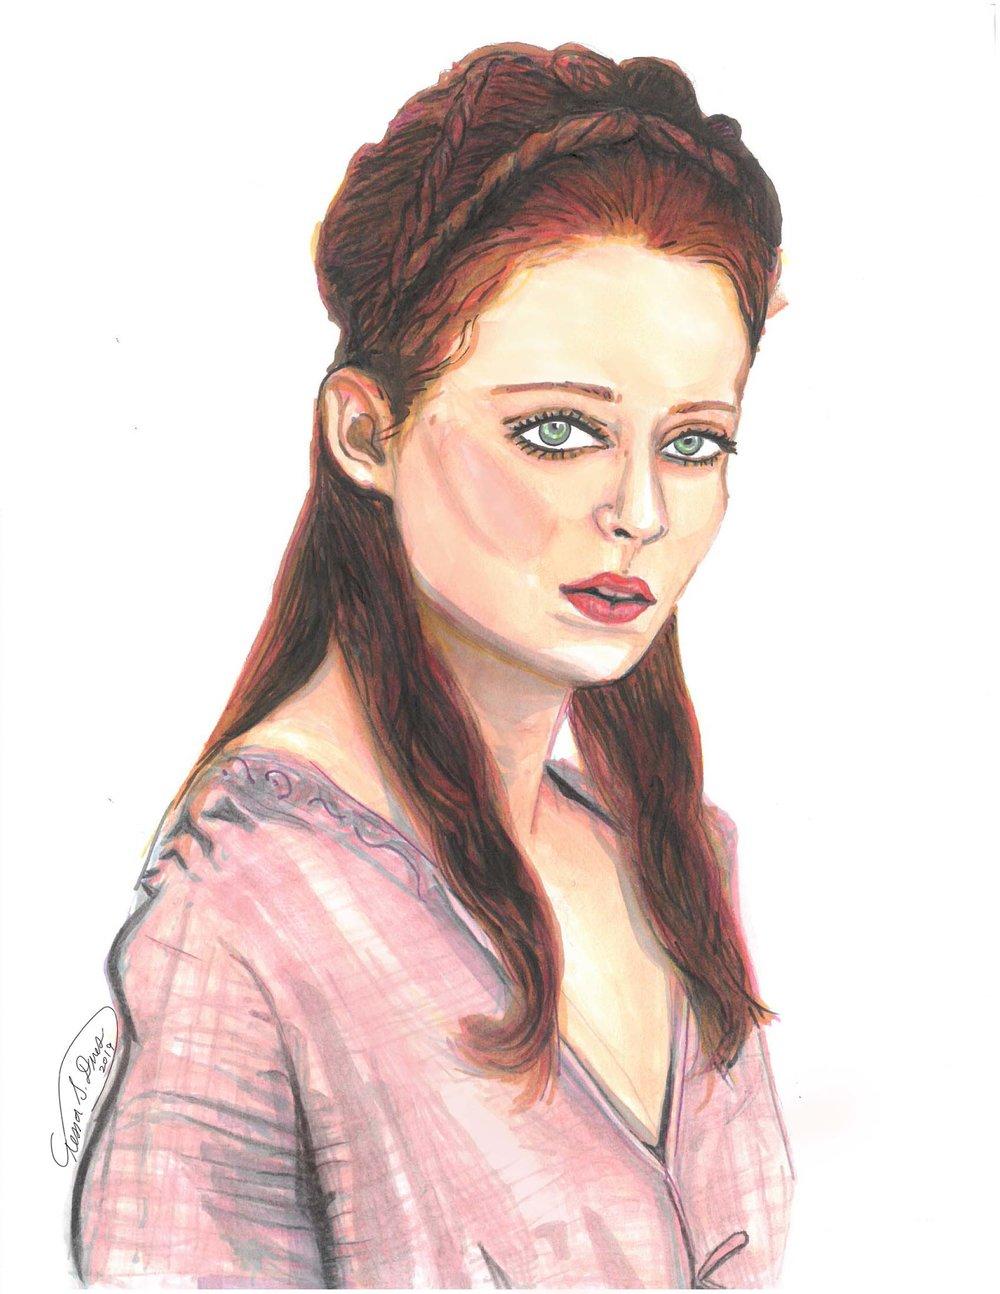 Sansa pink dress_drawing by tessa dines.jpg